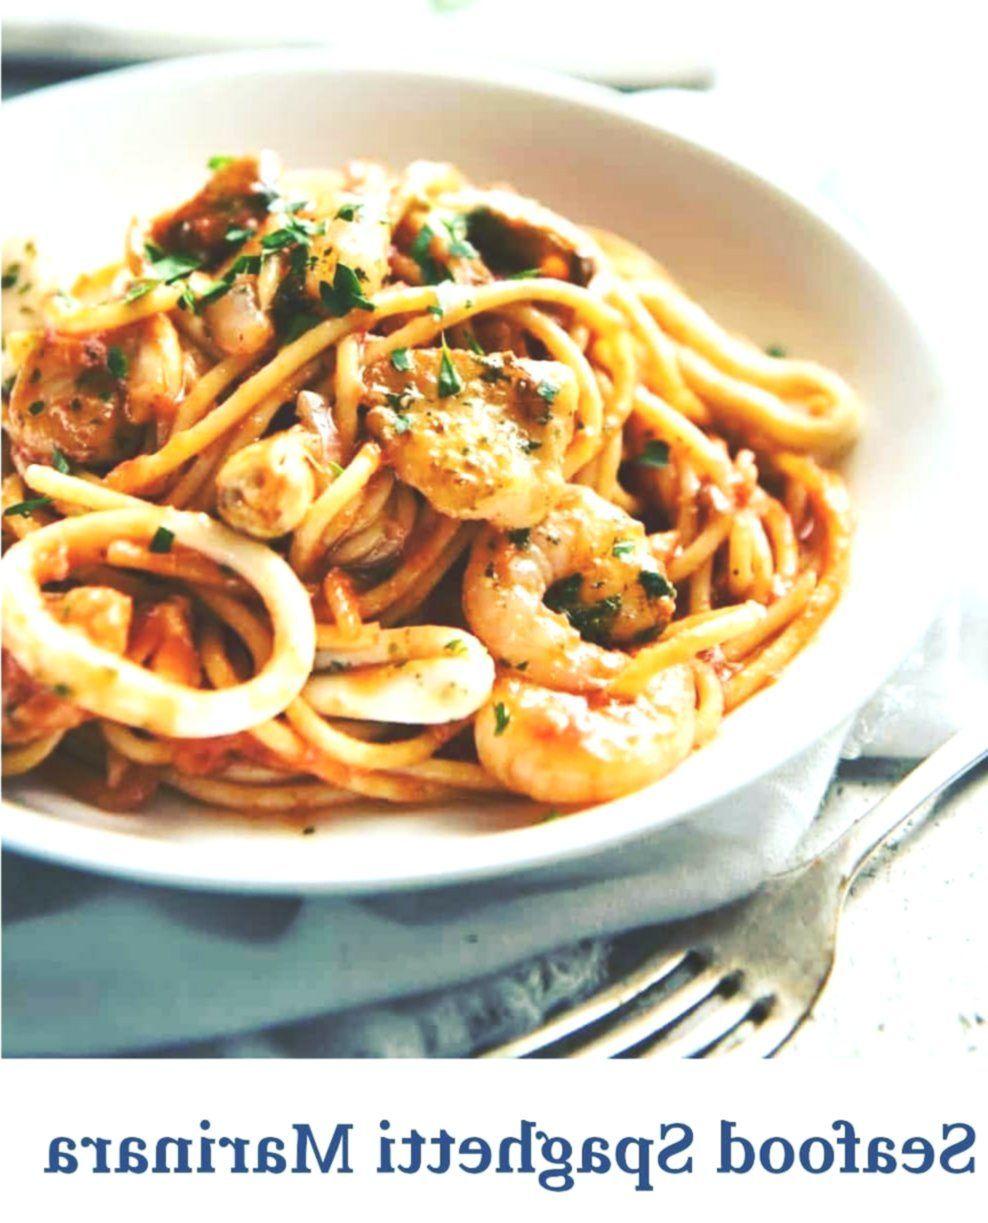 Spaghetti Marinara Zutaten 500 g getrocknete Spaghetti Nudeln oder andere  Spaghetti Marinara Zutaten 500 g getrocknete Spaghetti Nudeln oder andere